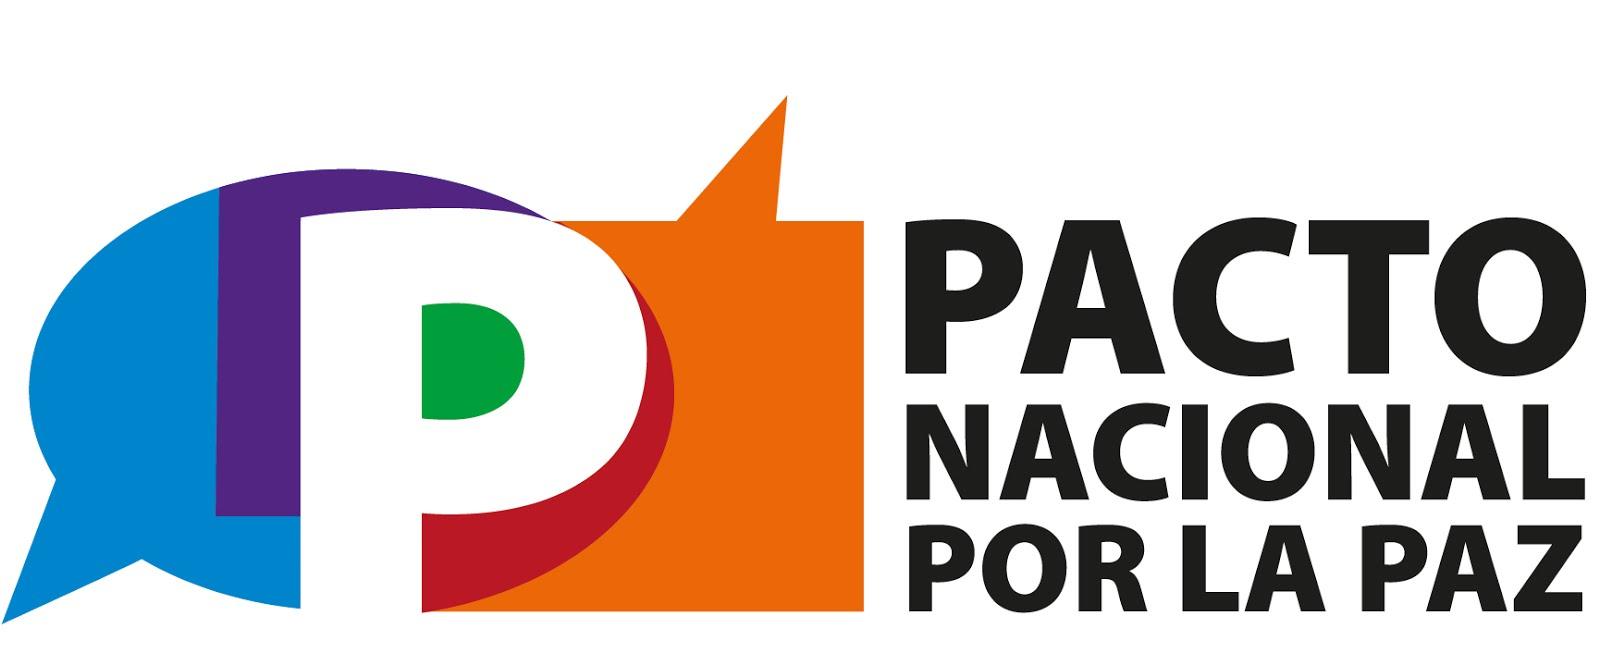 Comunicado Pacto Nacional por la Paz